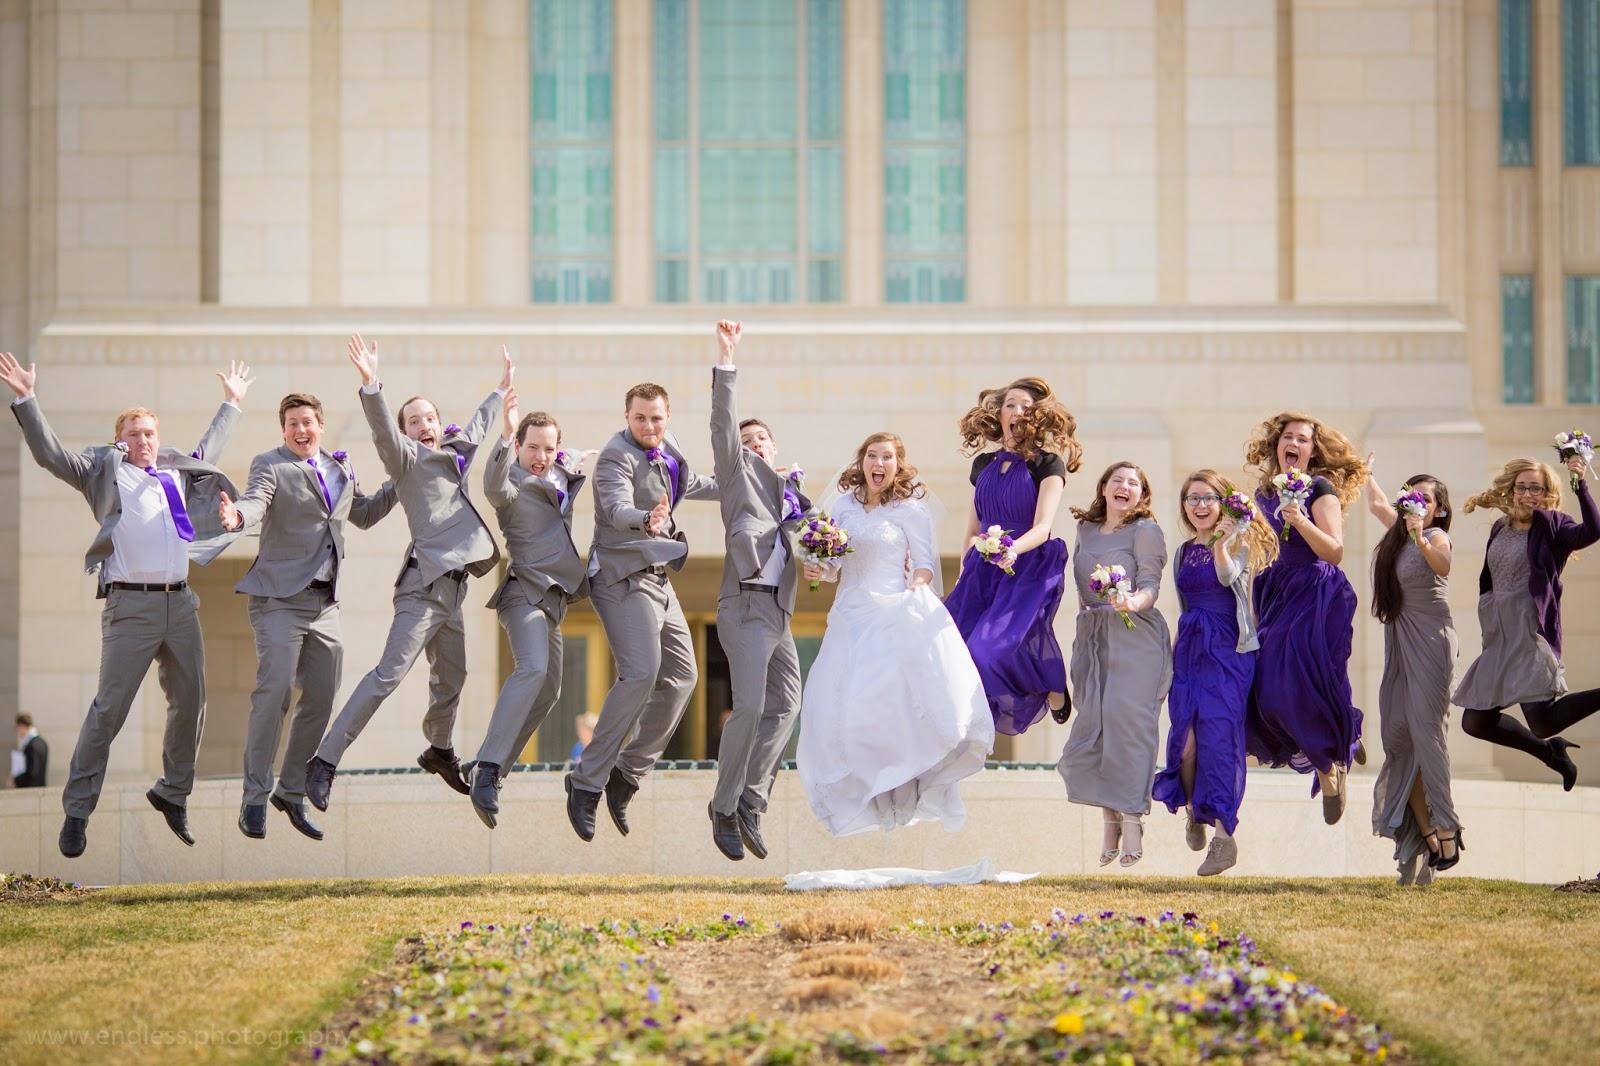 Logan Utah Wedding Photographer, Ogden LDS Temple, Spring, Wedding, Temple, Utah, Summer, Couple, Photographer, Photography, Endless Photography